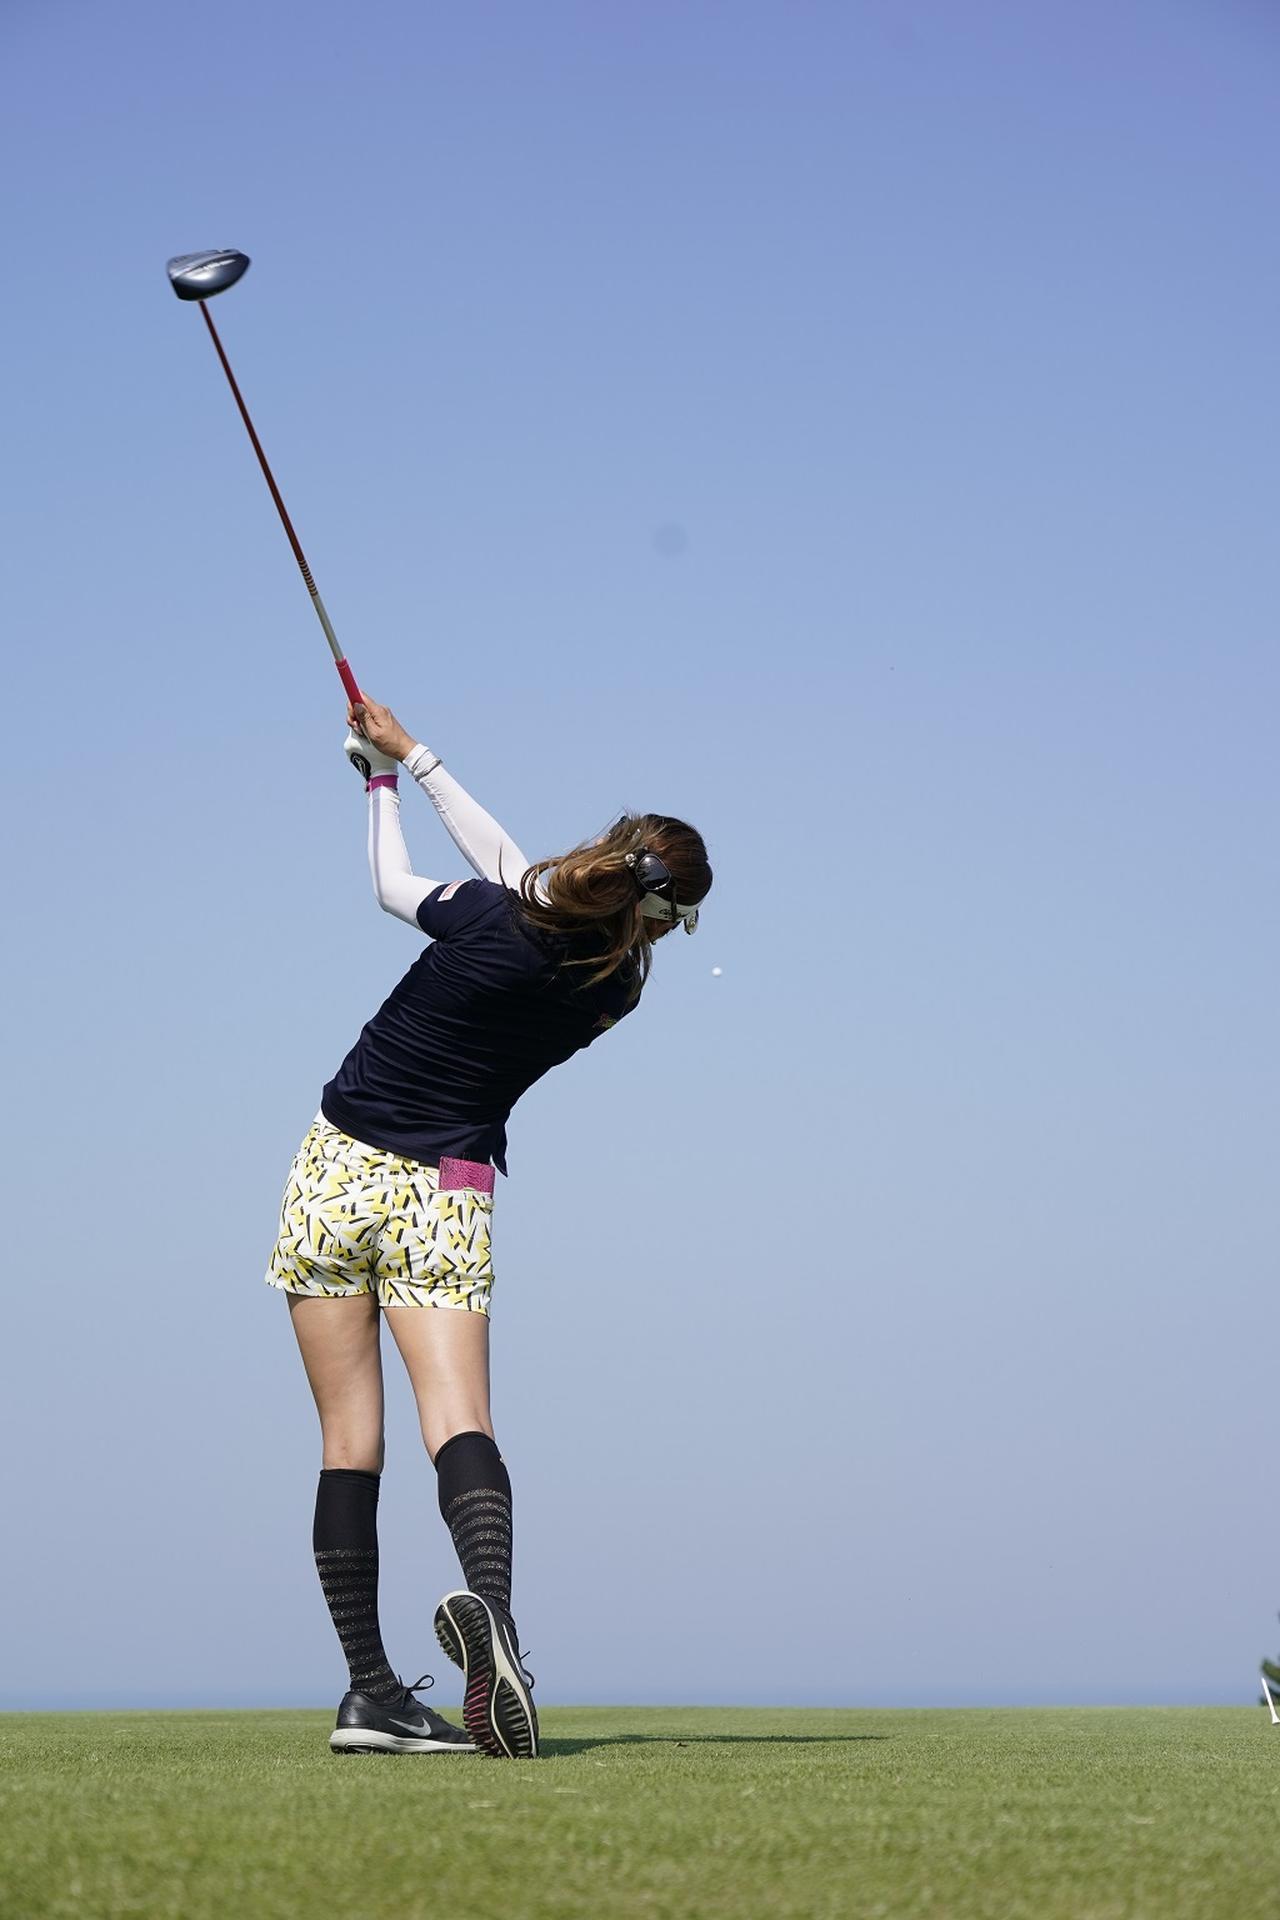 Images : 13番目の画像 - 金田久美子ドライバー後方連続写真 - みんなのゴルフダイジェスト